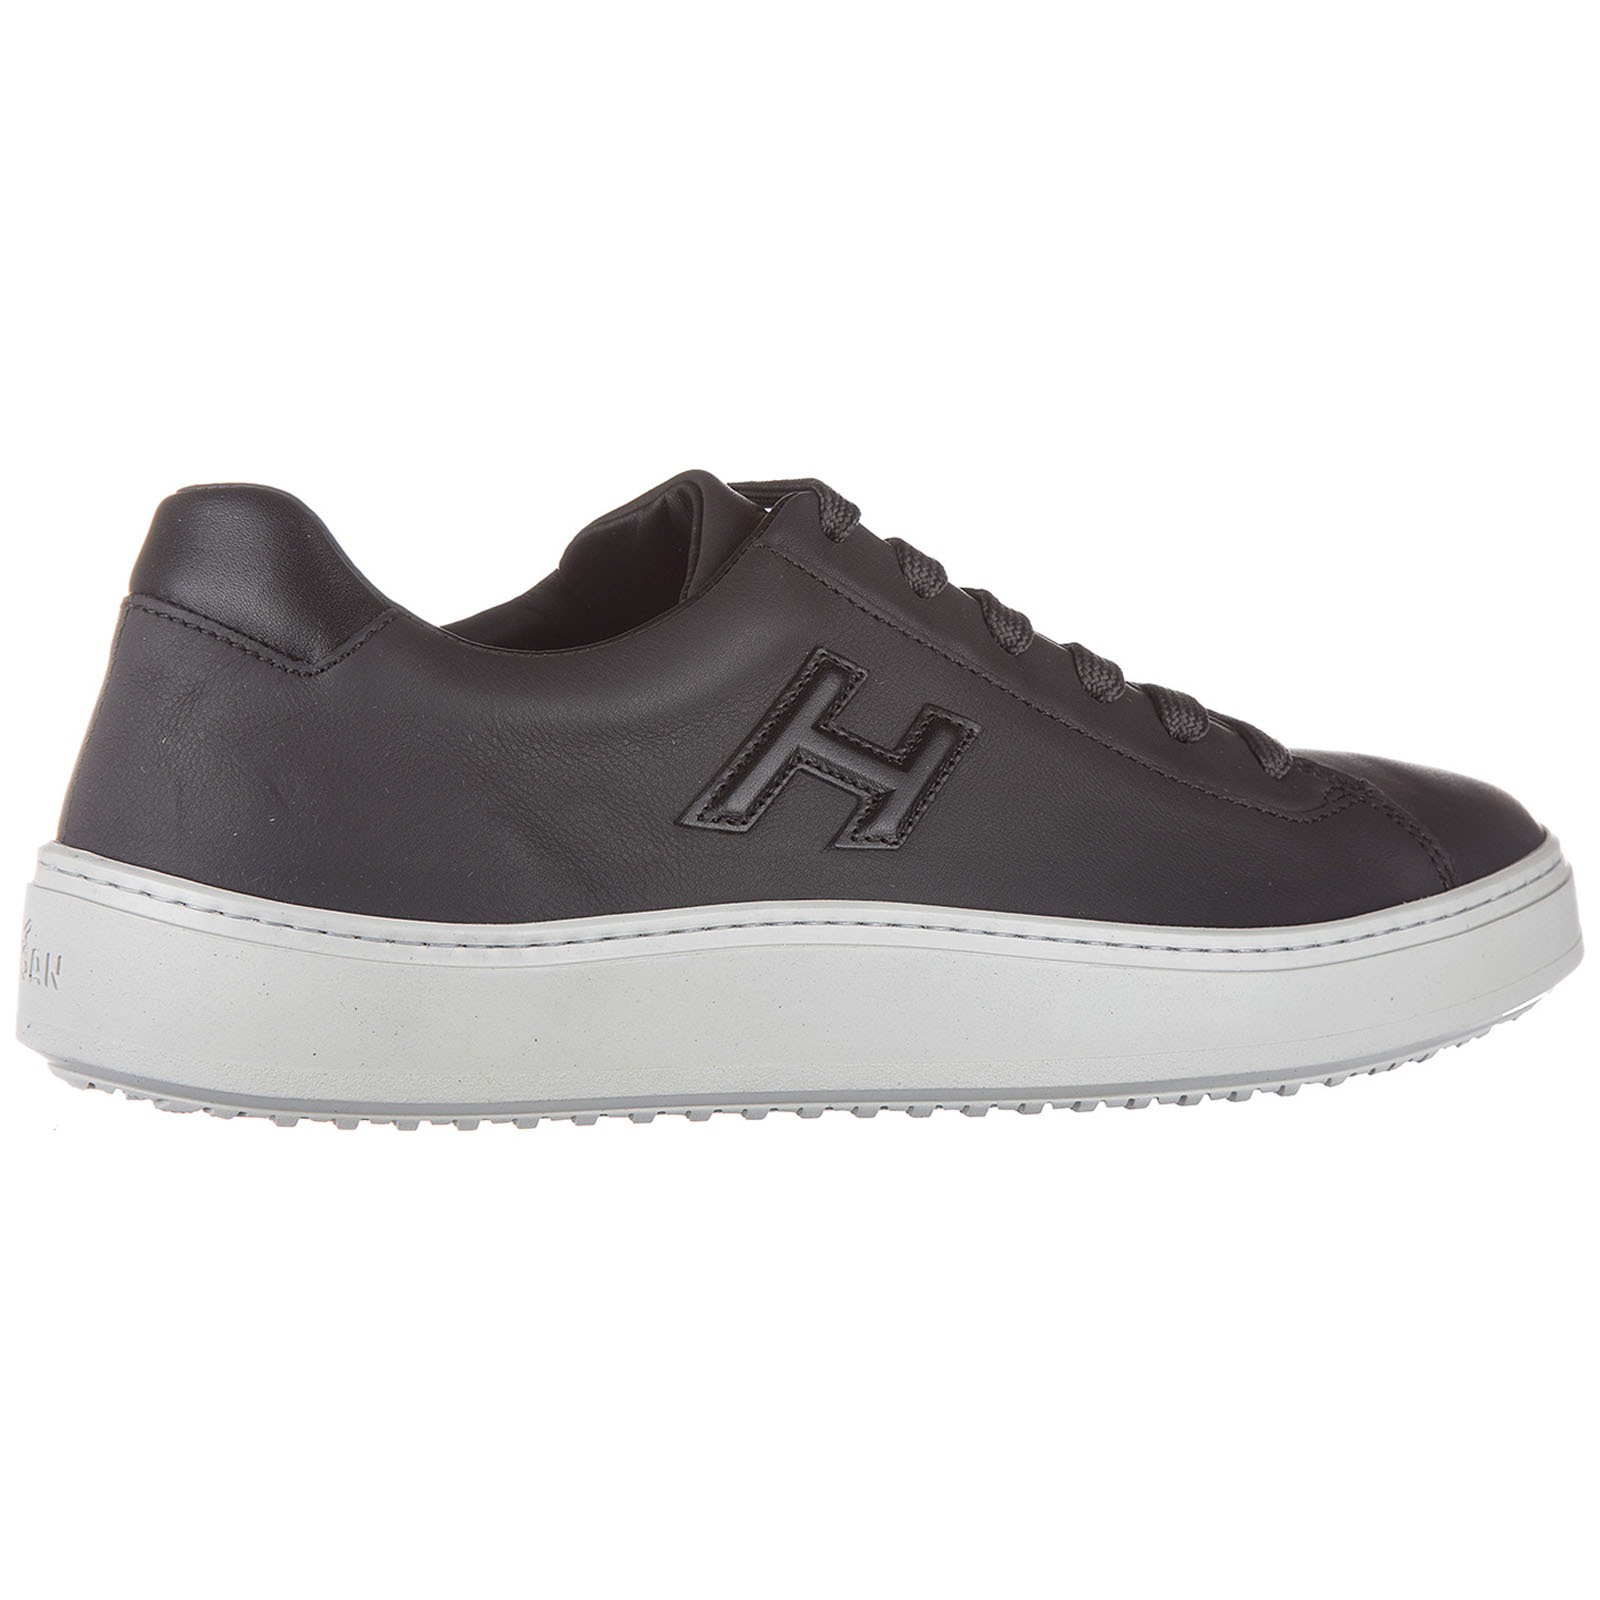 ... Herrenschuhe herren leder schuhe sneakers h302 urban cupsole sporty  style ... a0696b1176d